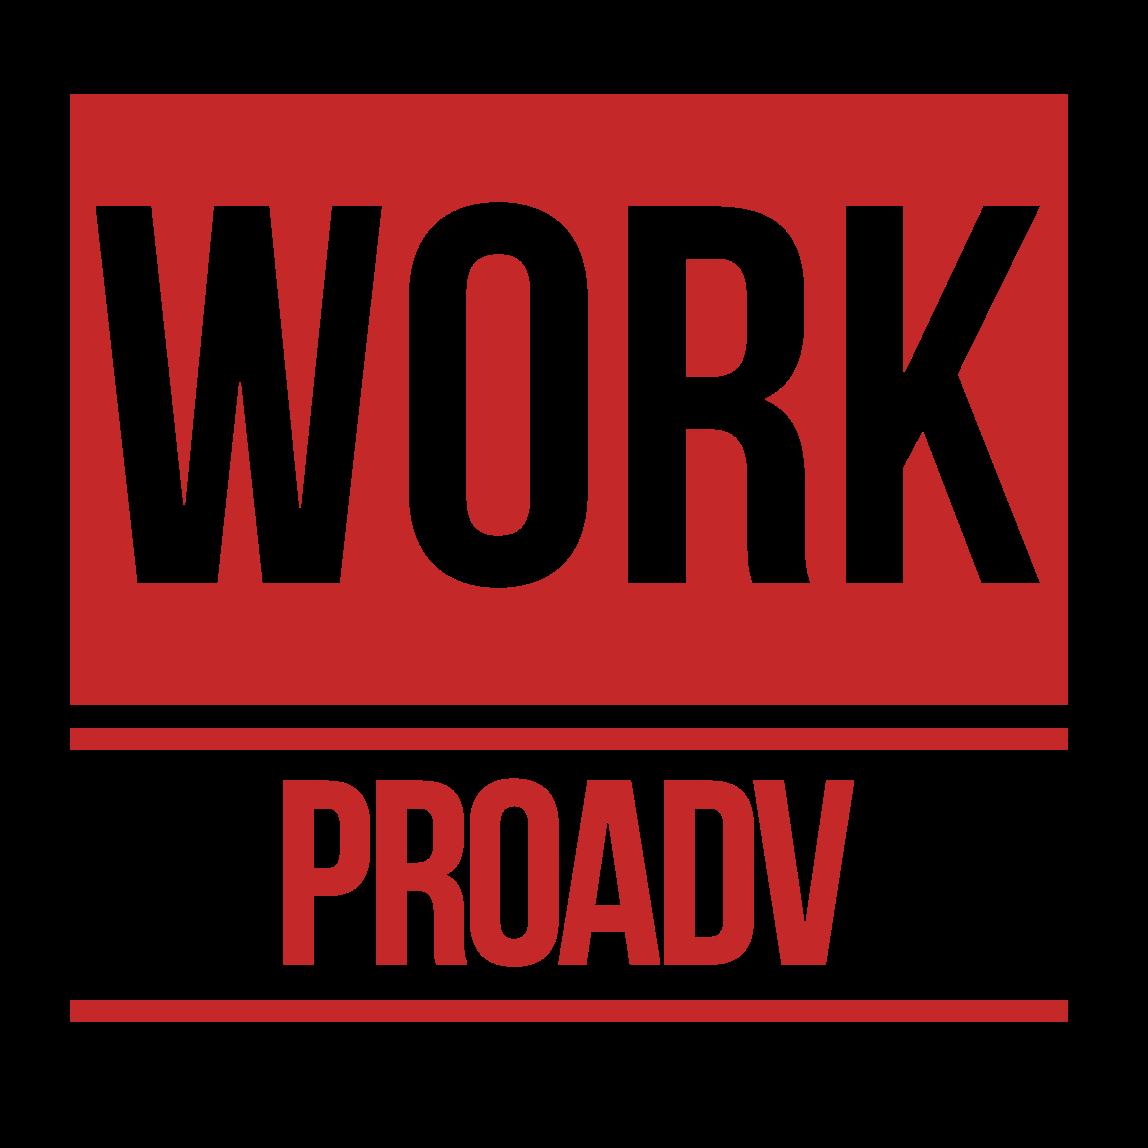 Proadv Work